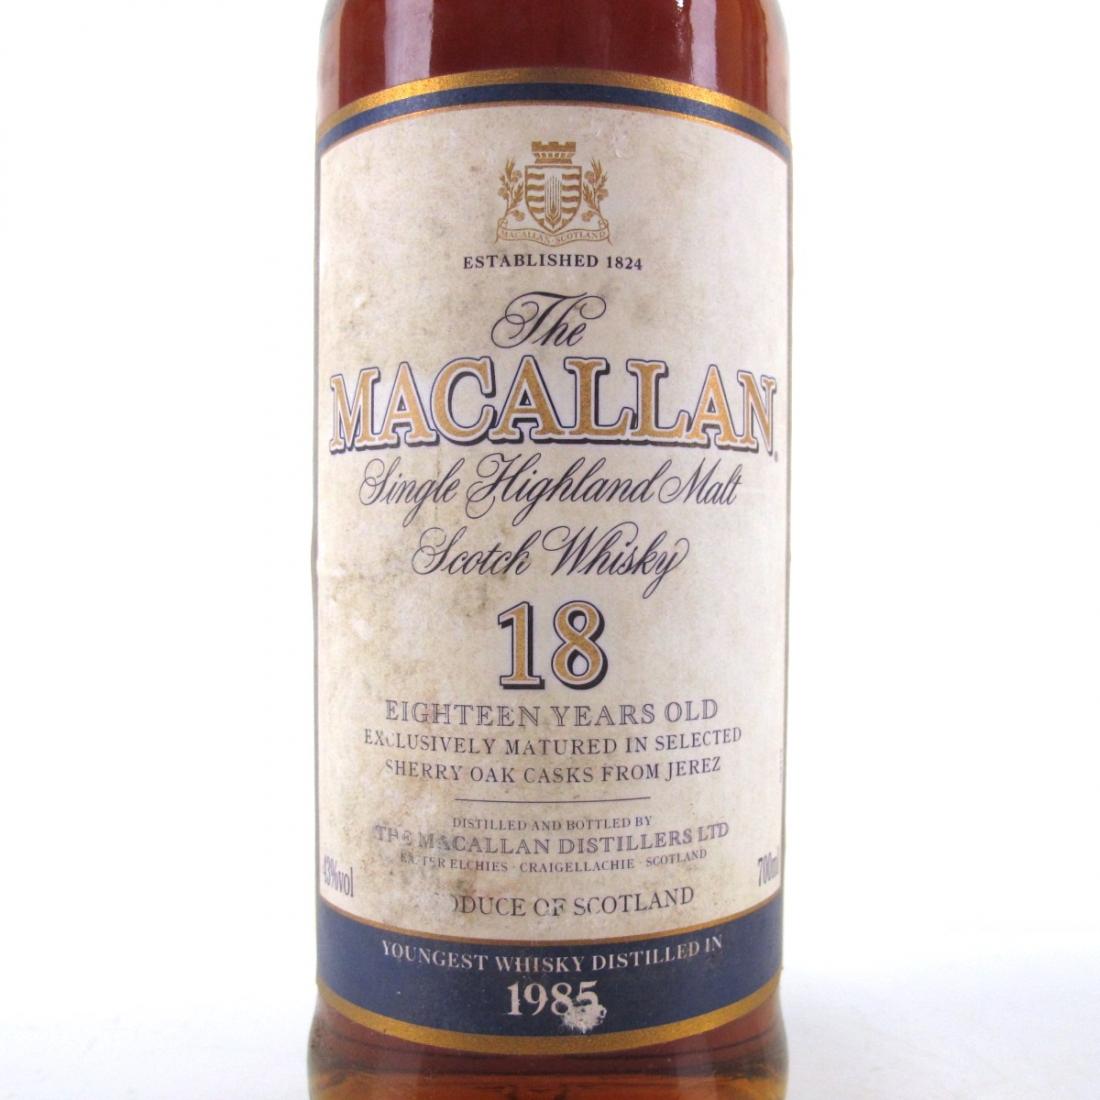 Macallan 18 Year Old 1985